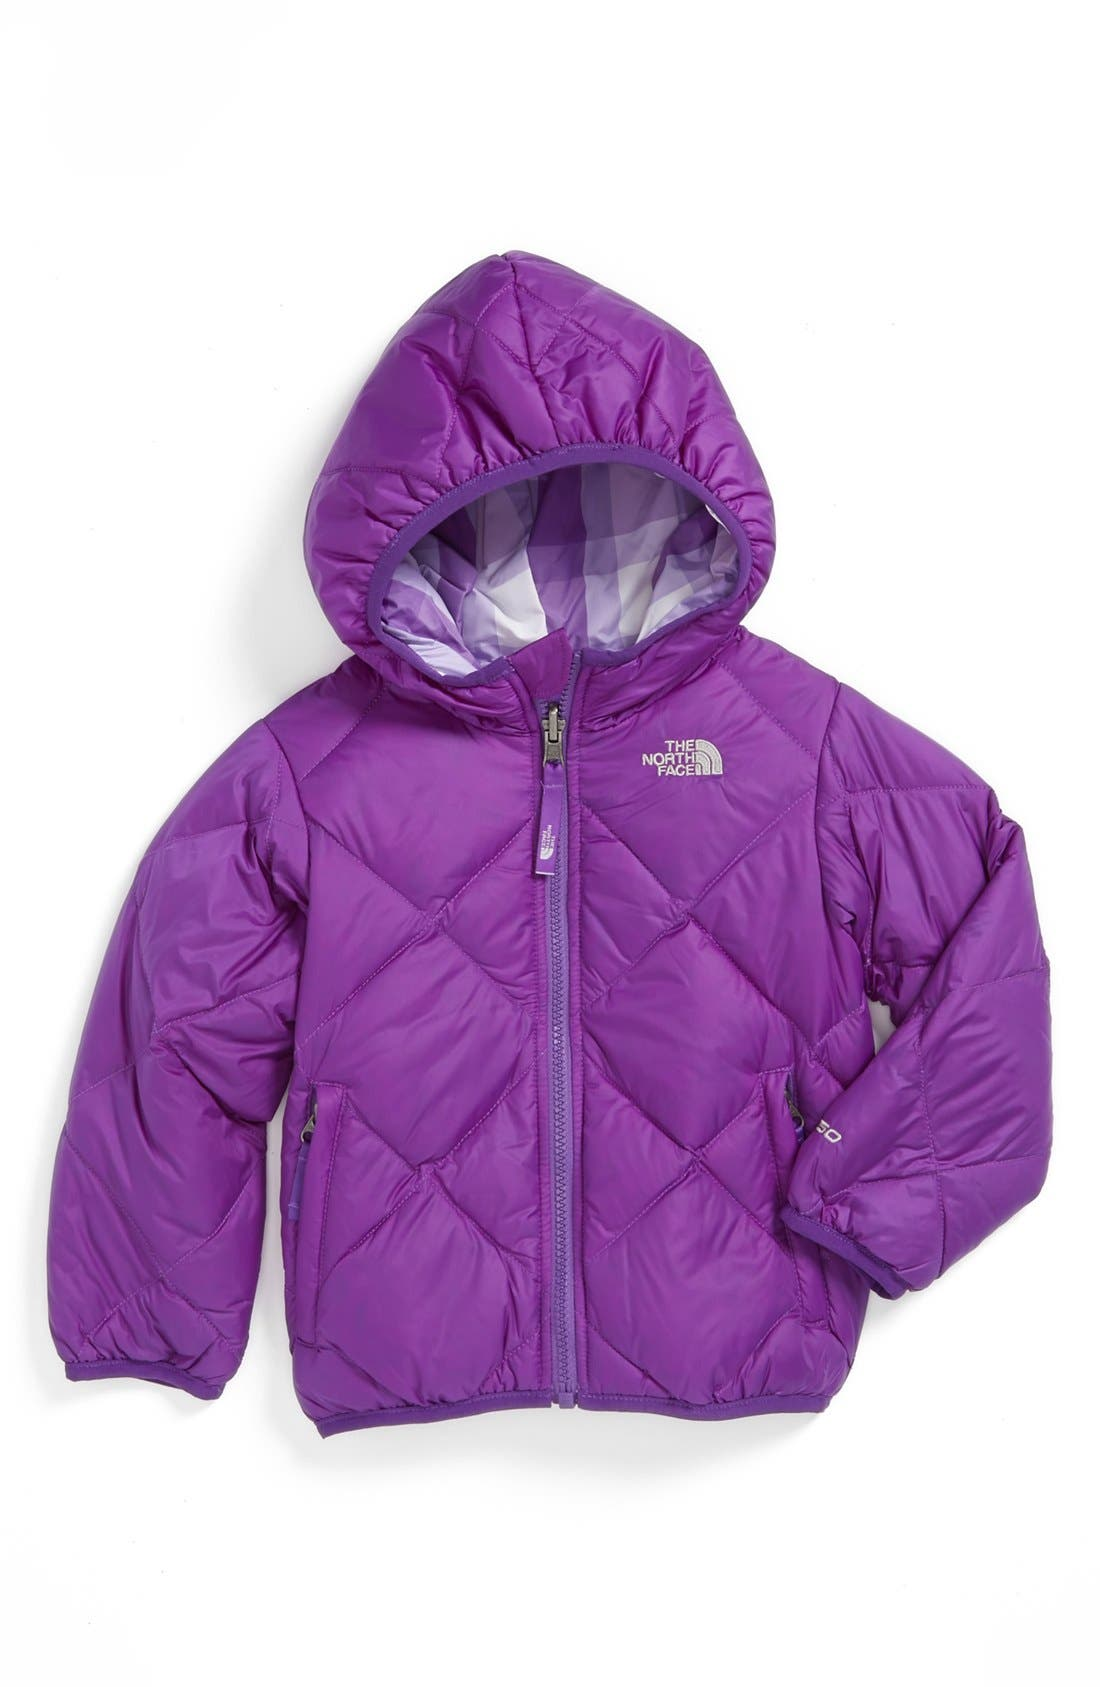 Main Image - The North Face 'Moondoggy' Reversible Jacket (Toddler Girls)